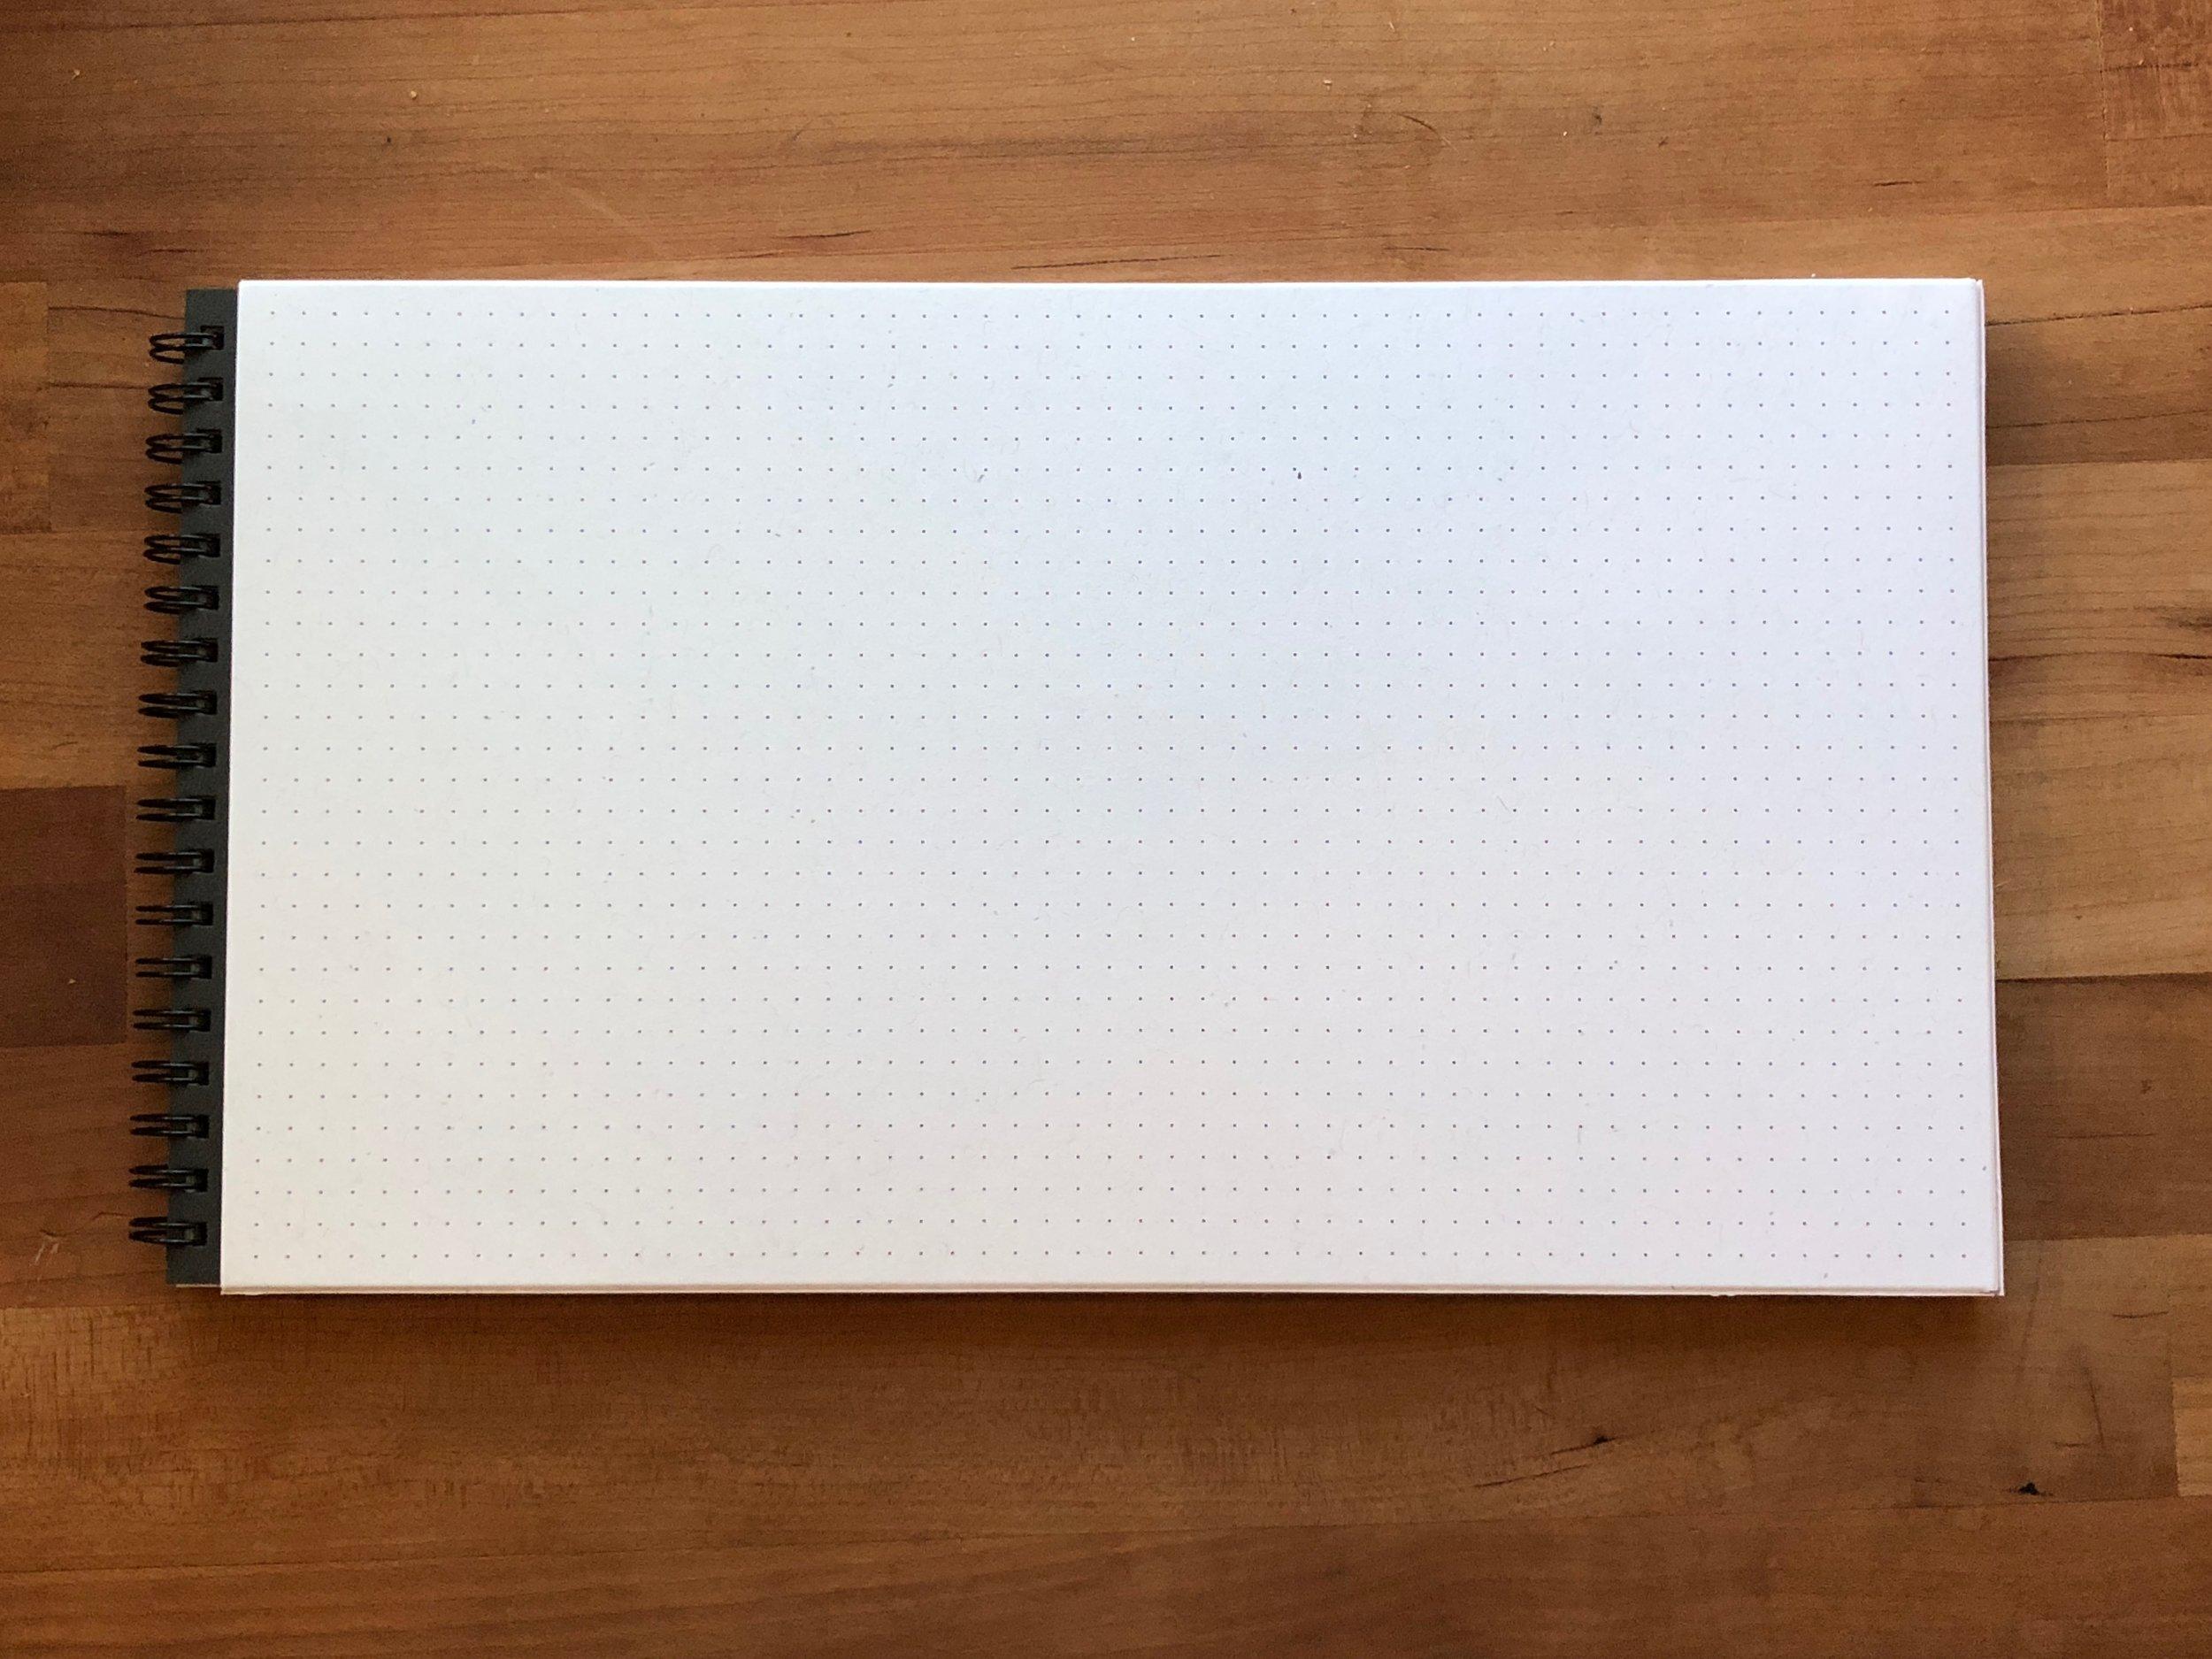 Slipcase is dot grid too!